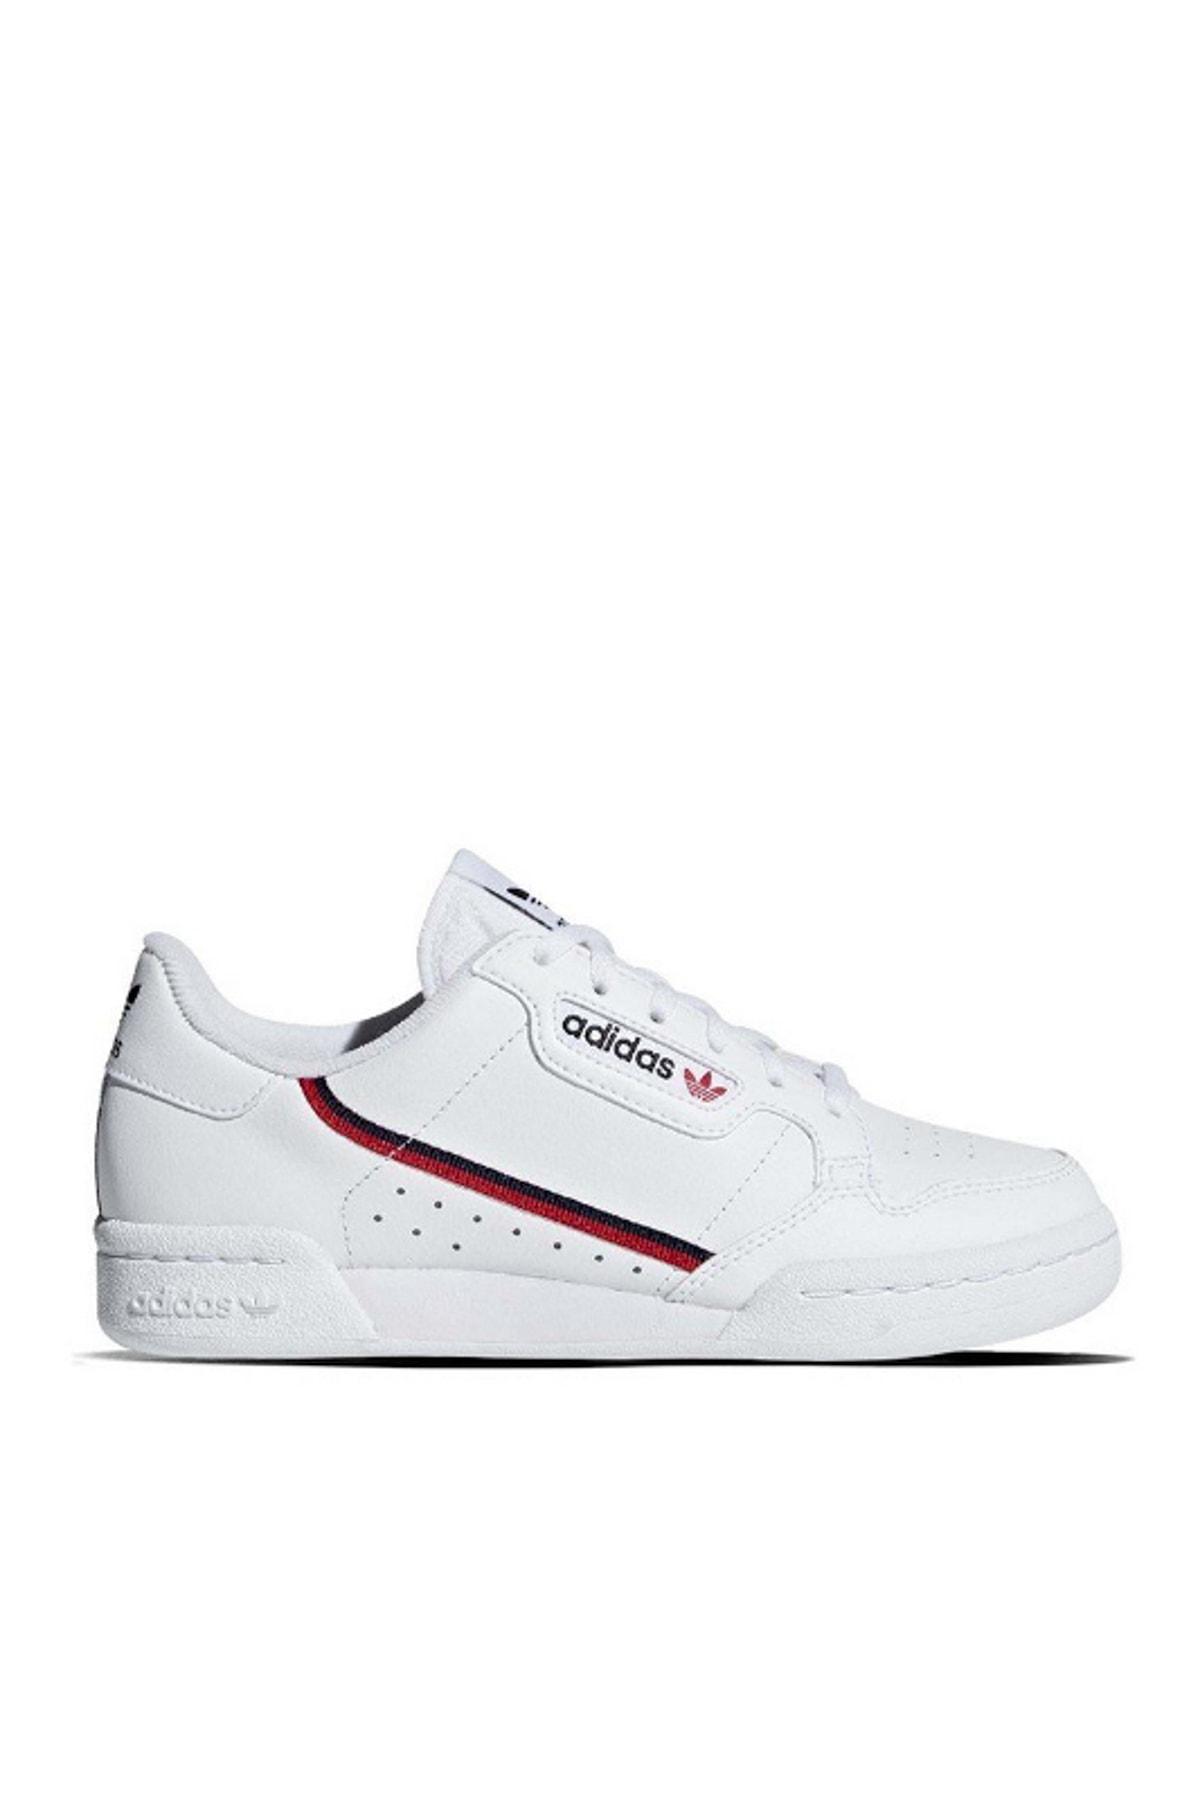 adidas CONTINENTAL 80 J Çocuk Spor Ayakkabı 1